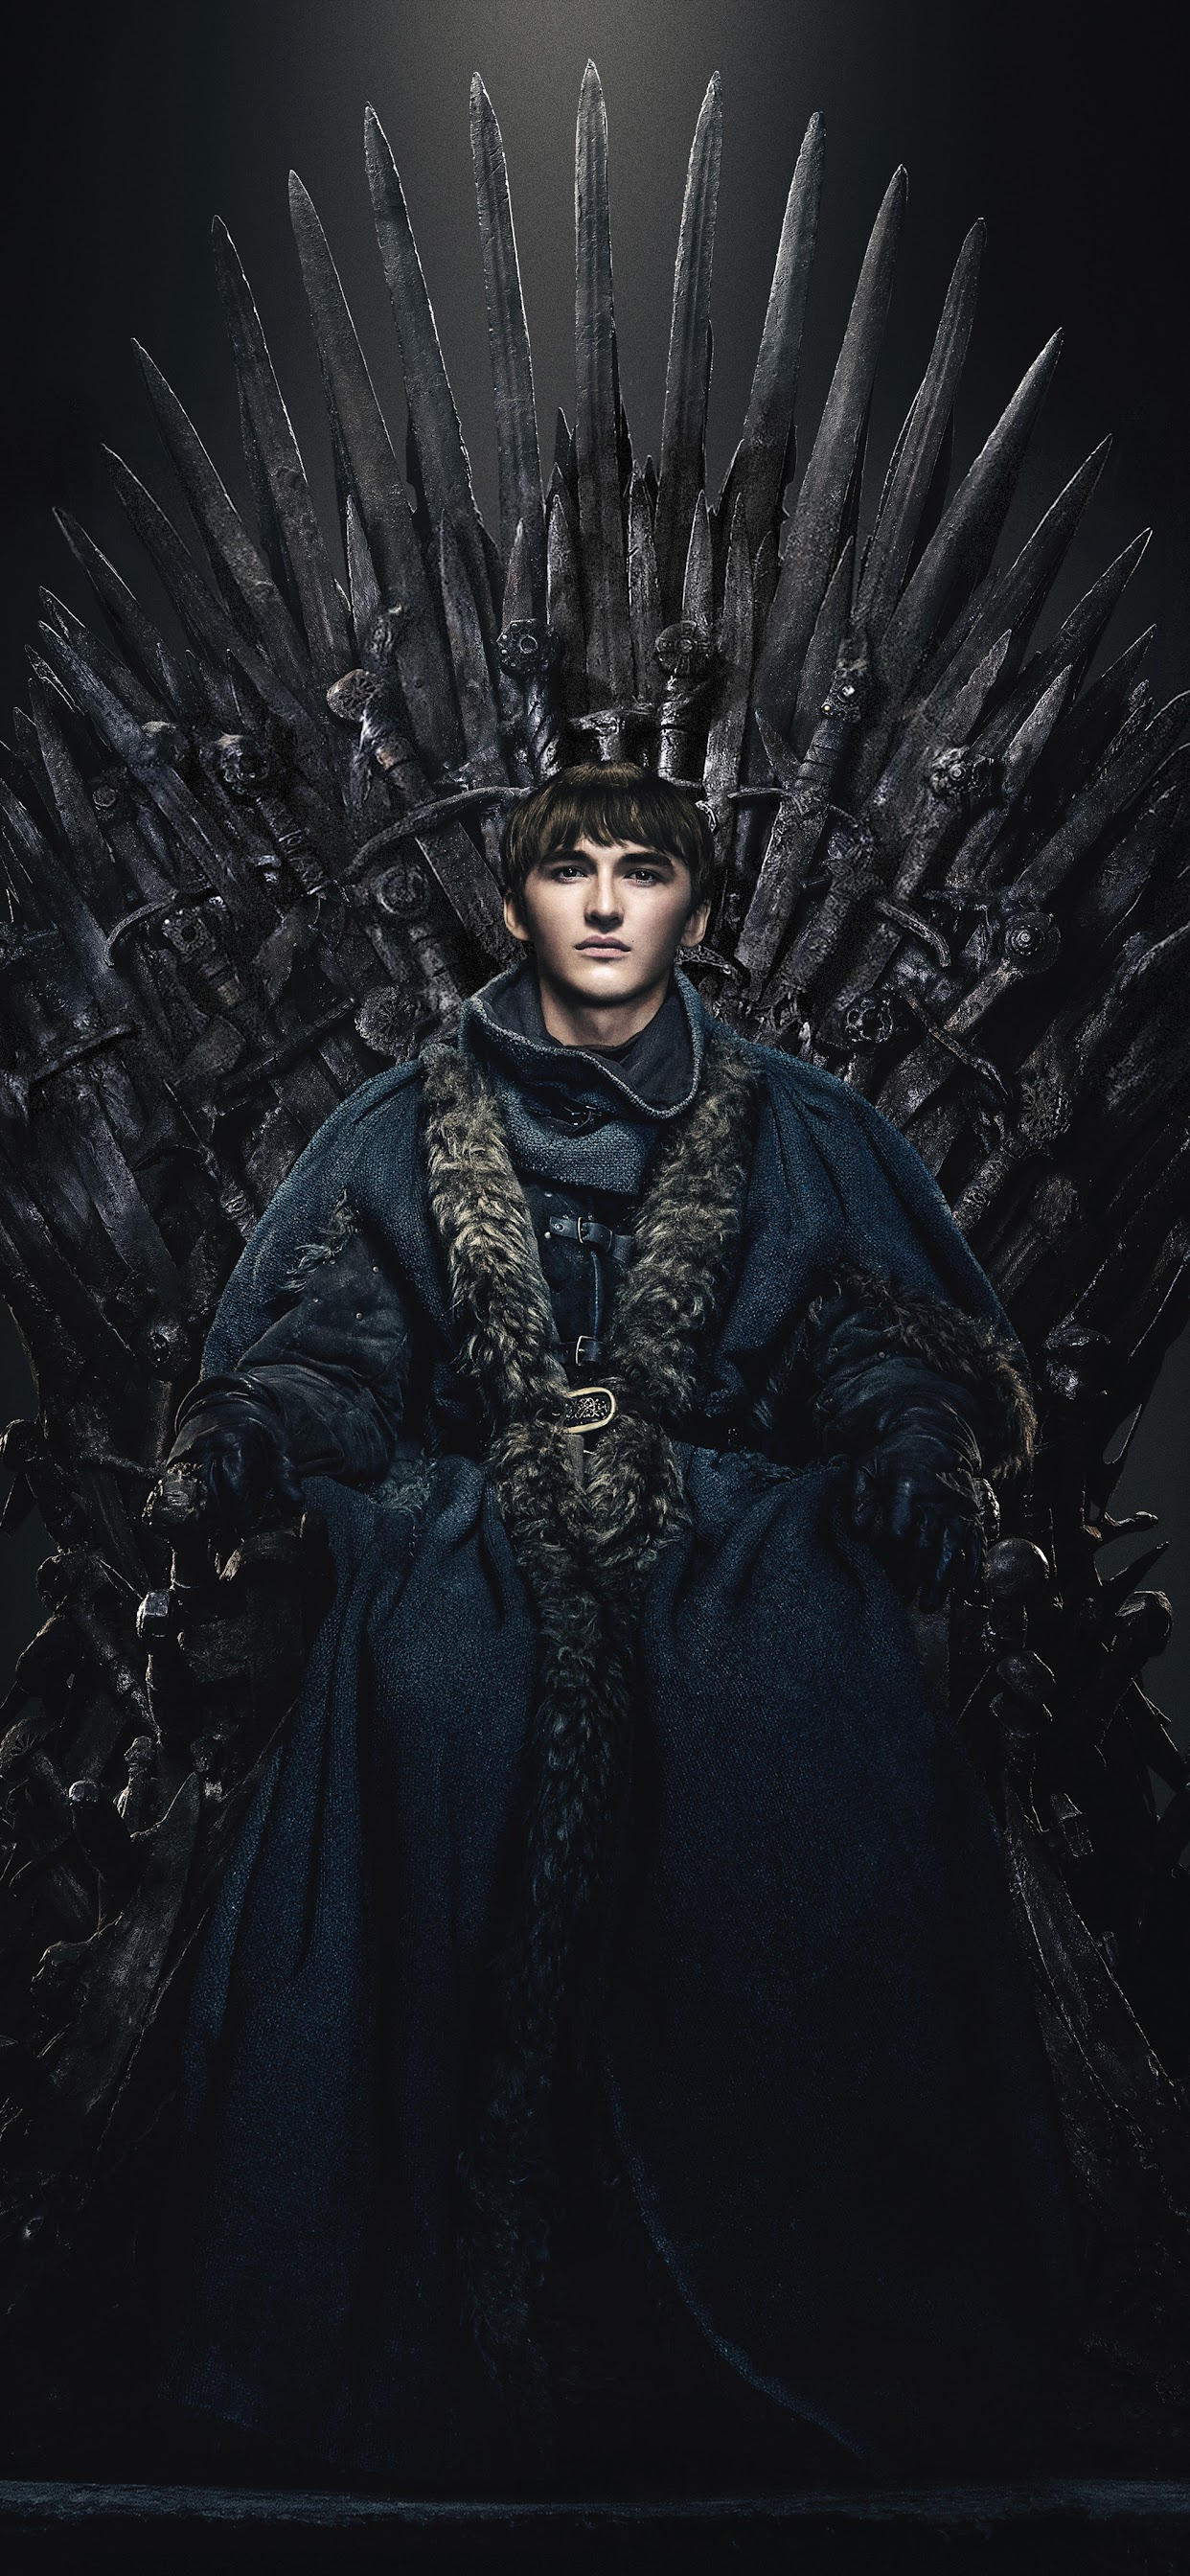 A Longa Noite (Guerra dos Tronos) - 05 vagas. Bran-stark-game-of-thrones-iron-throne-season-8-uhdpaper.com-8K-85